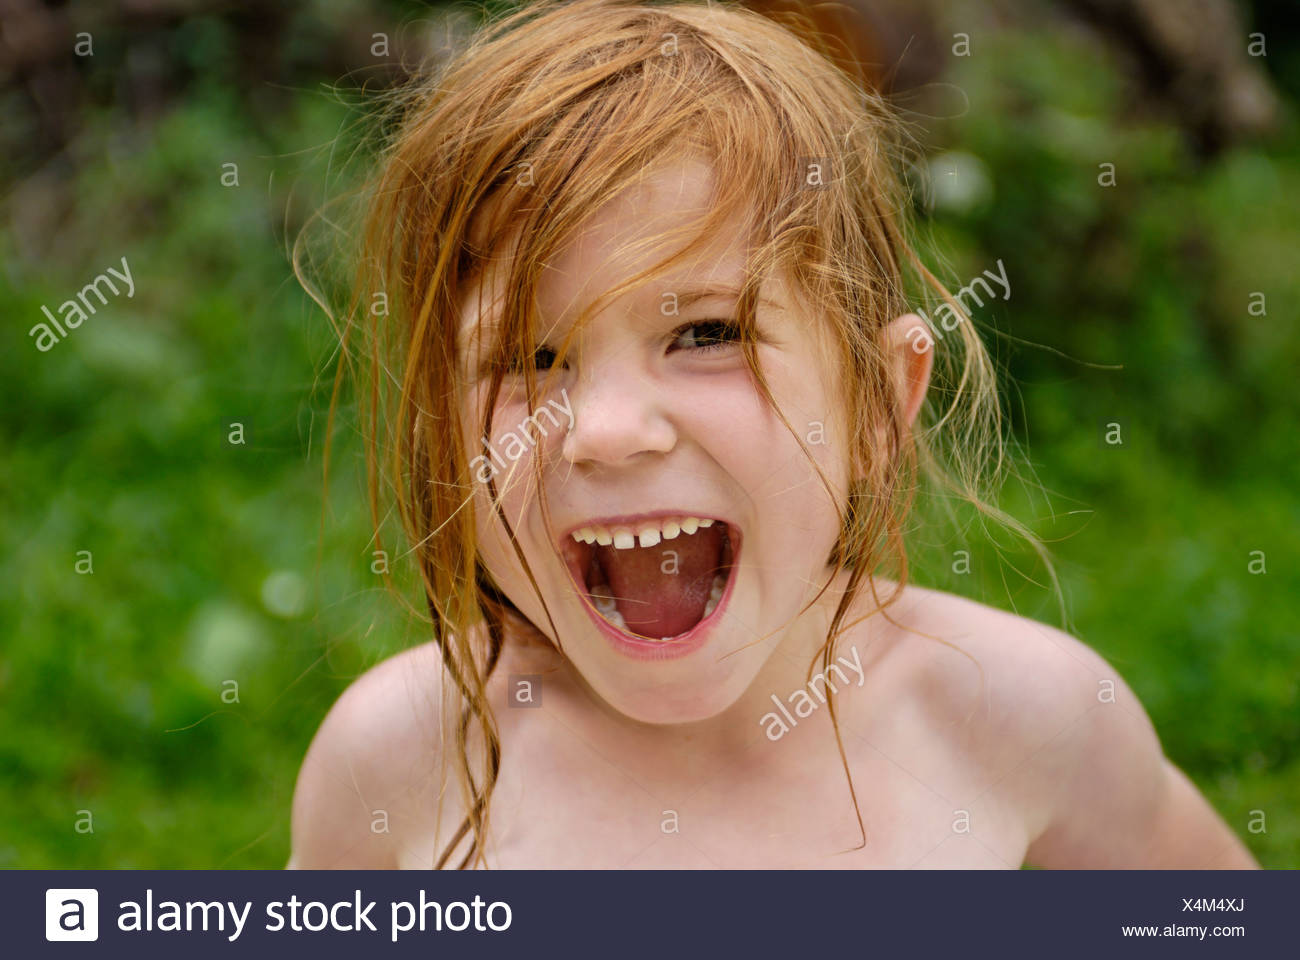 Little girl cries shouts screams very loud - Stock Image